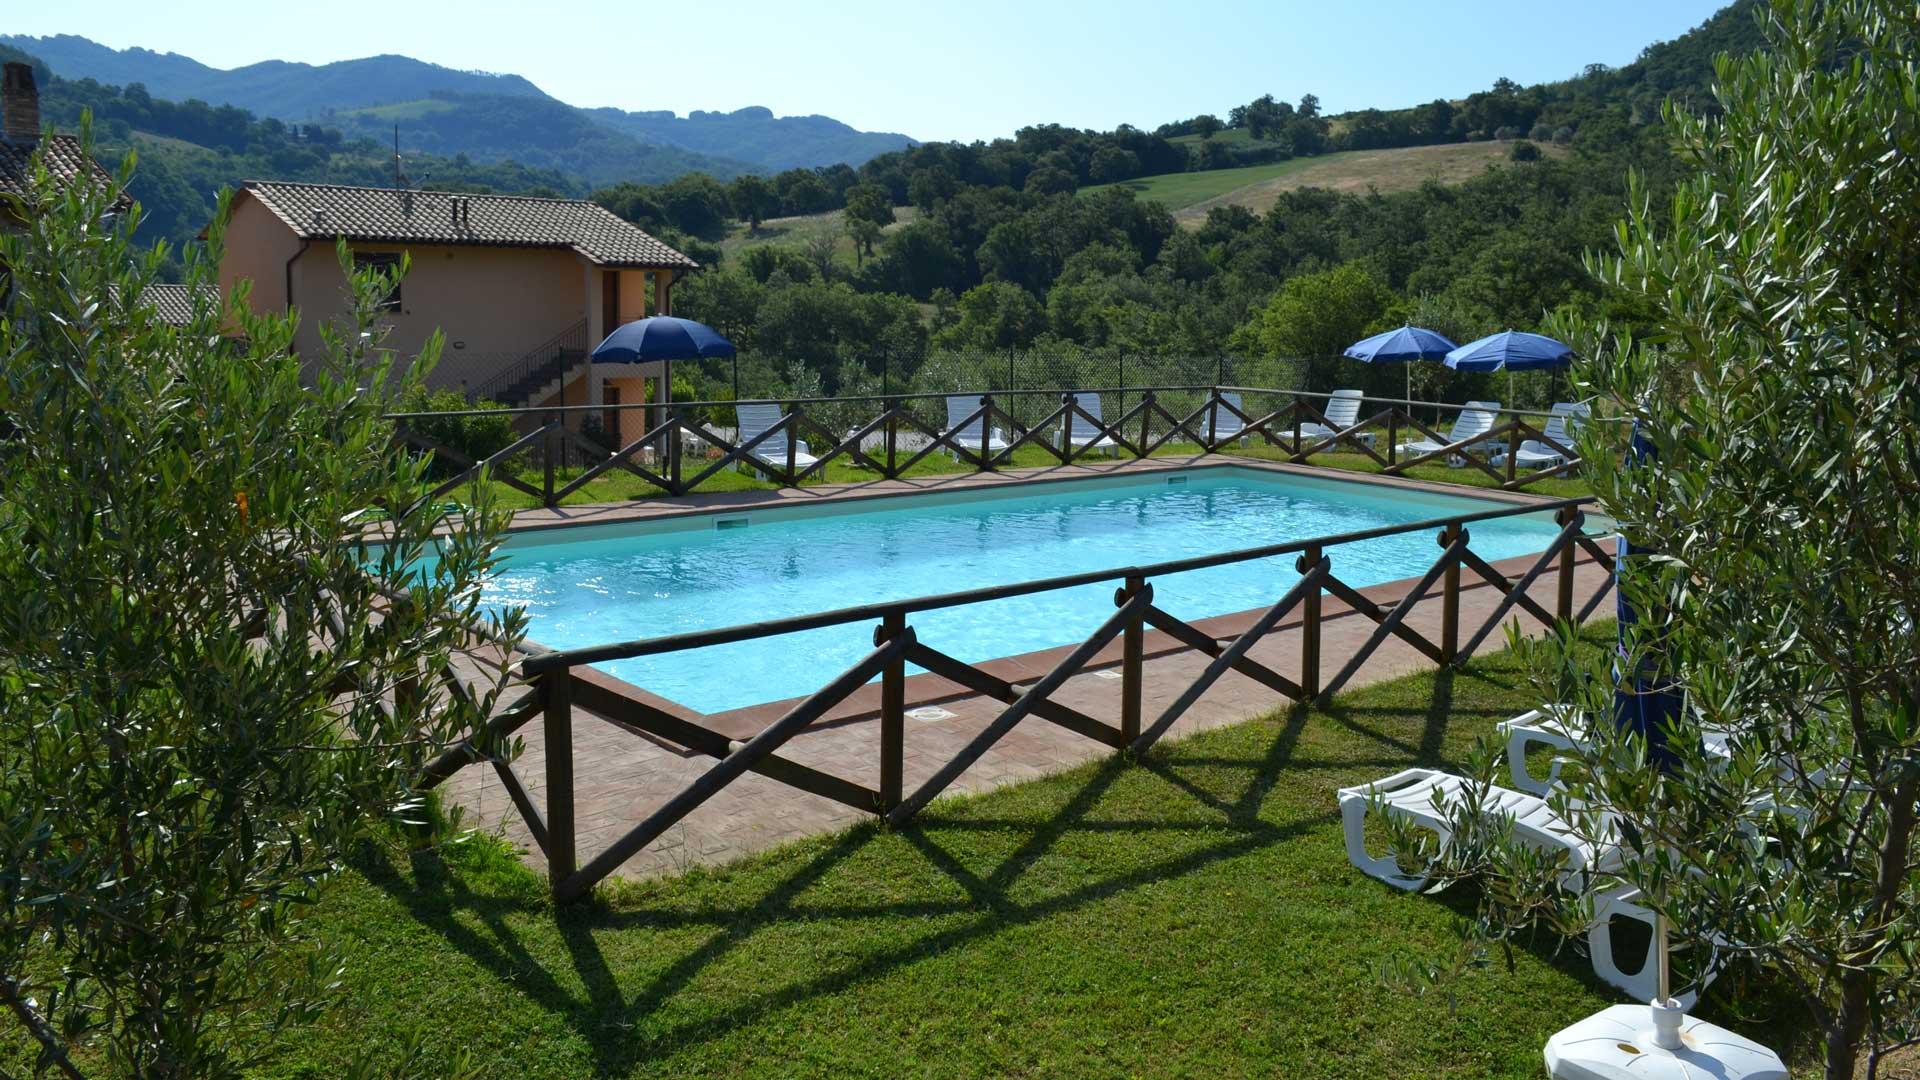 Servizi | Agriturismo Relais Parco del Subasio Assisi